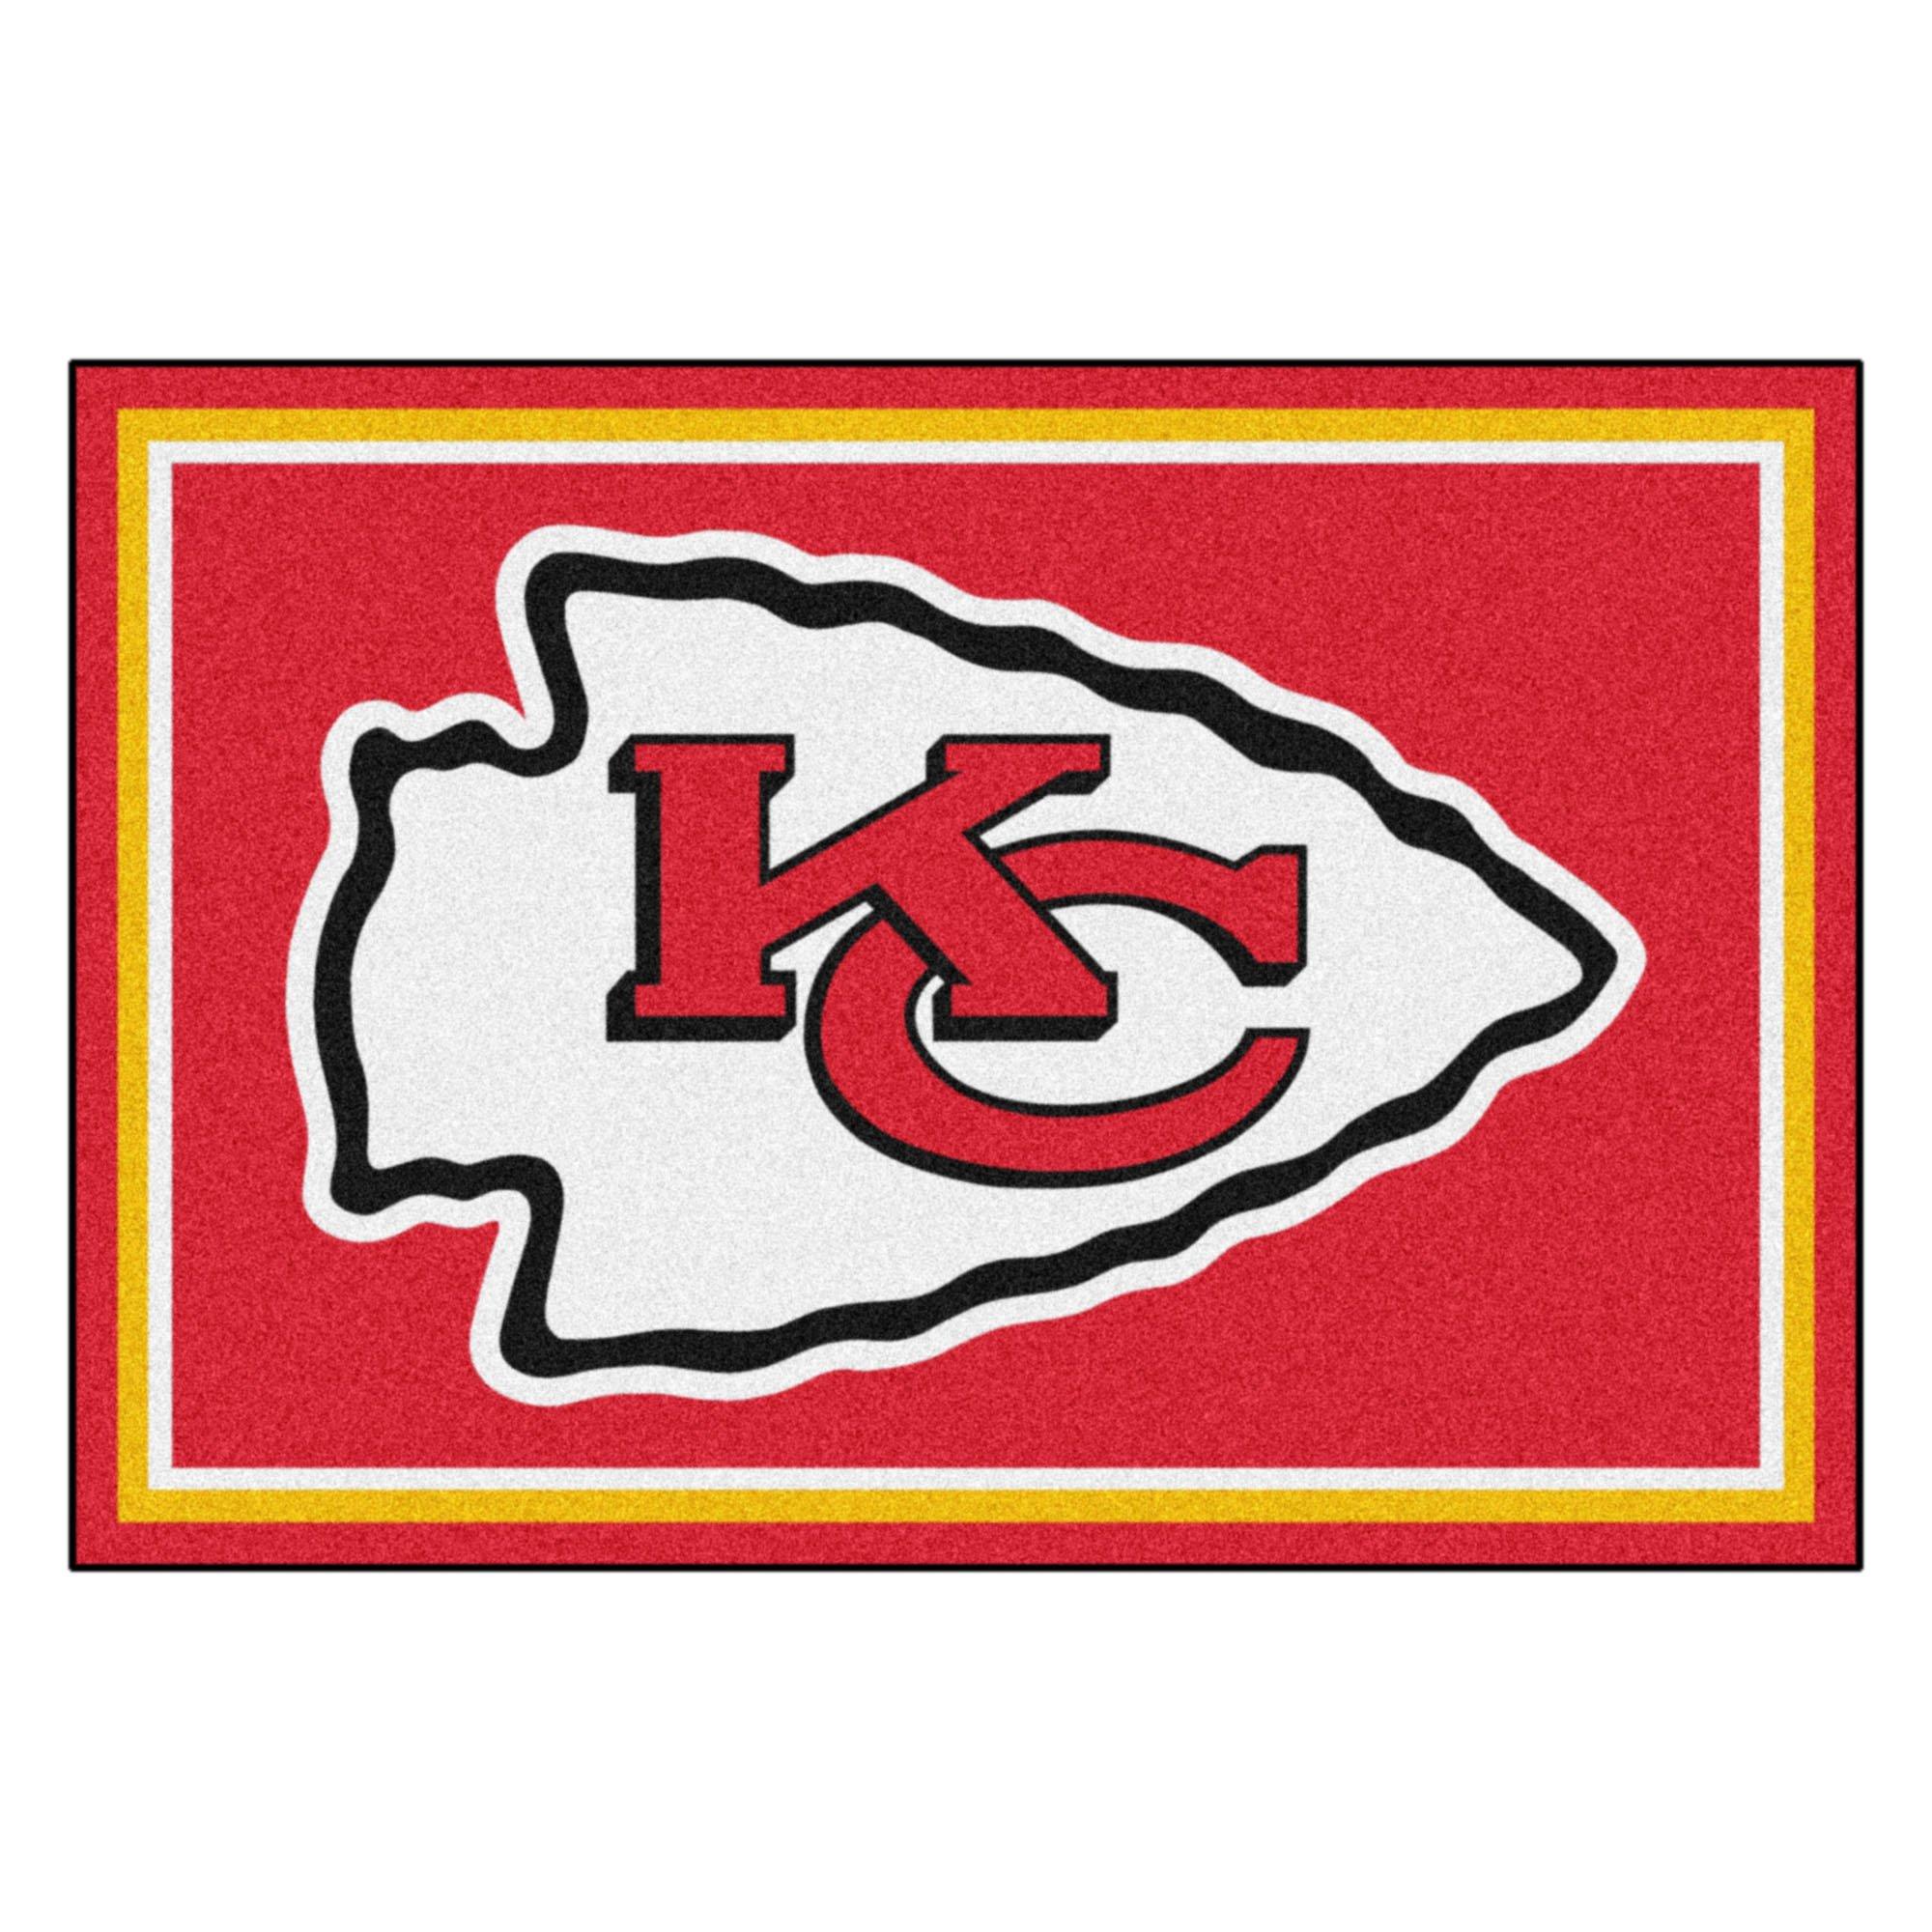 FANMATS NFL Kansas City Chiefs Nylon Face 5X8 Plush Rug by Fanmats (Image #1)